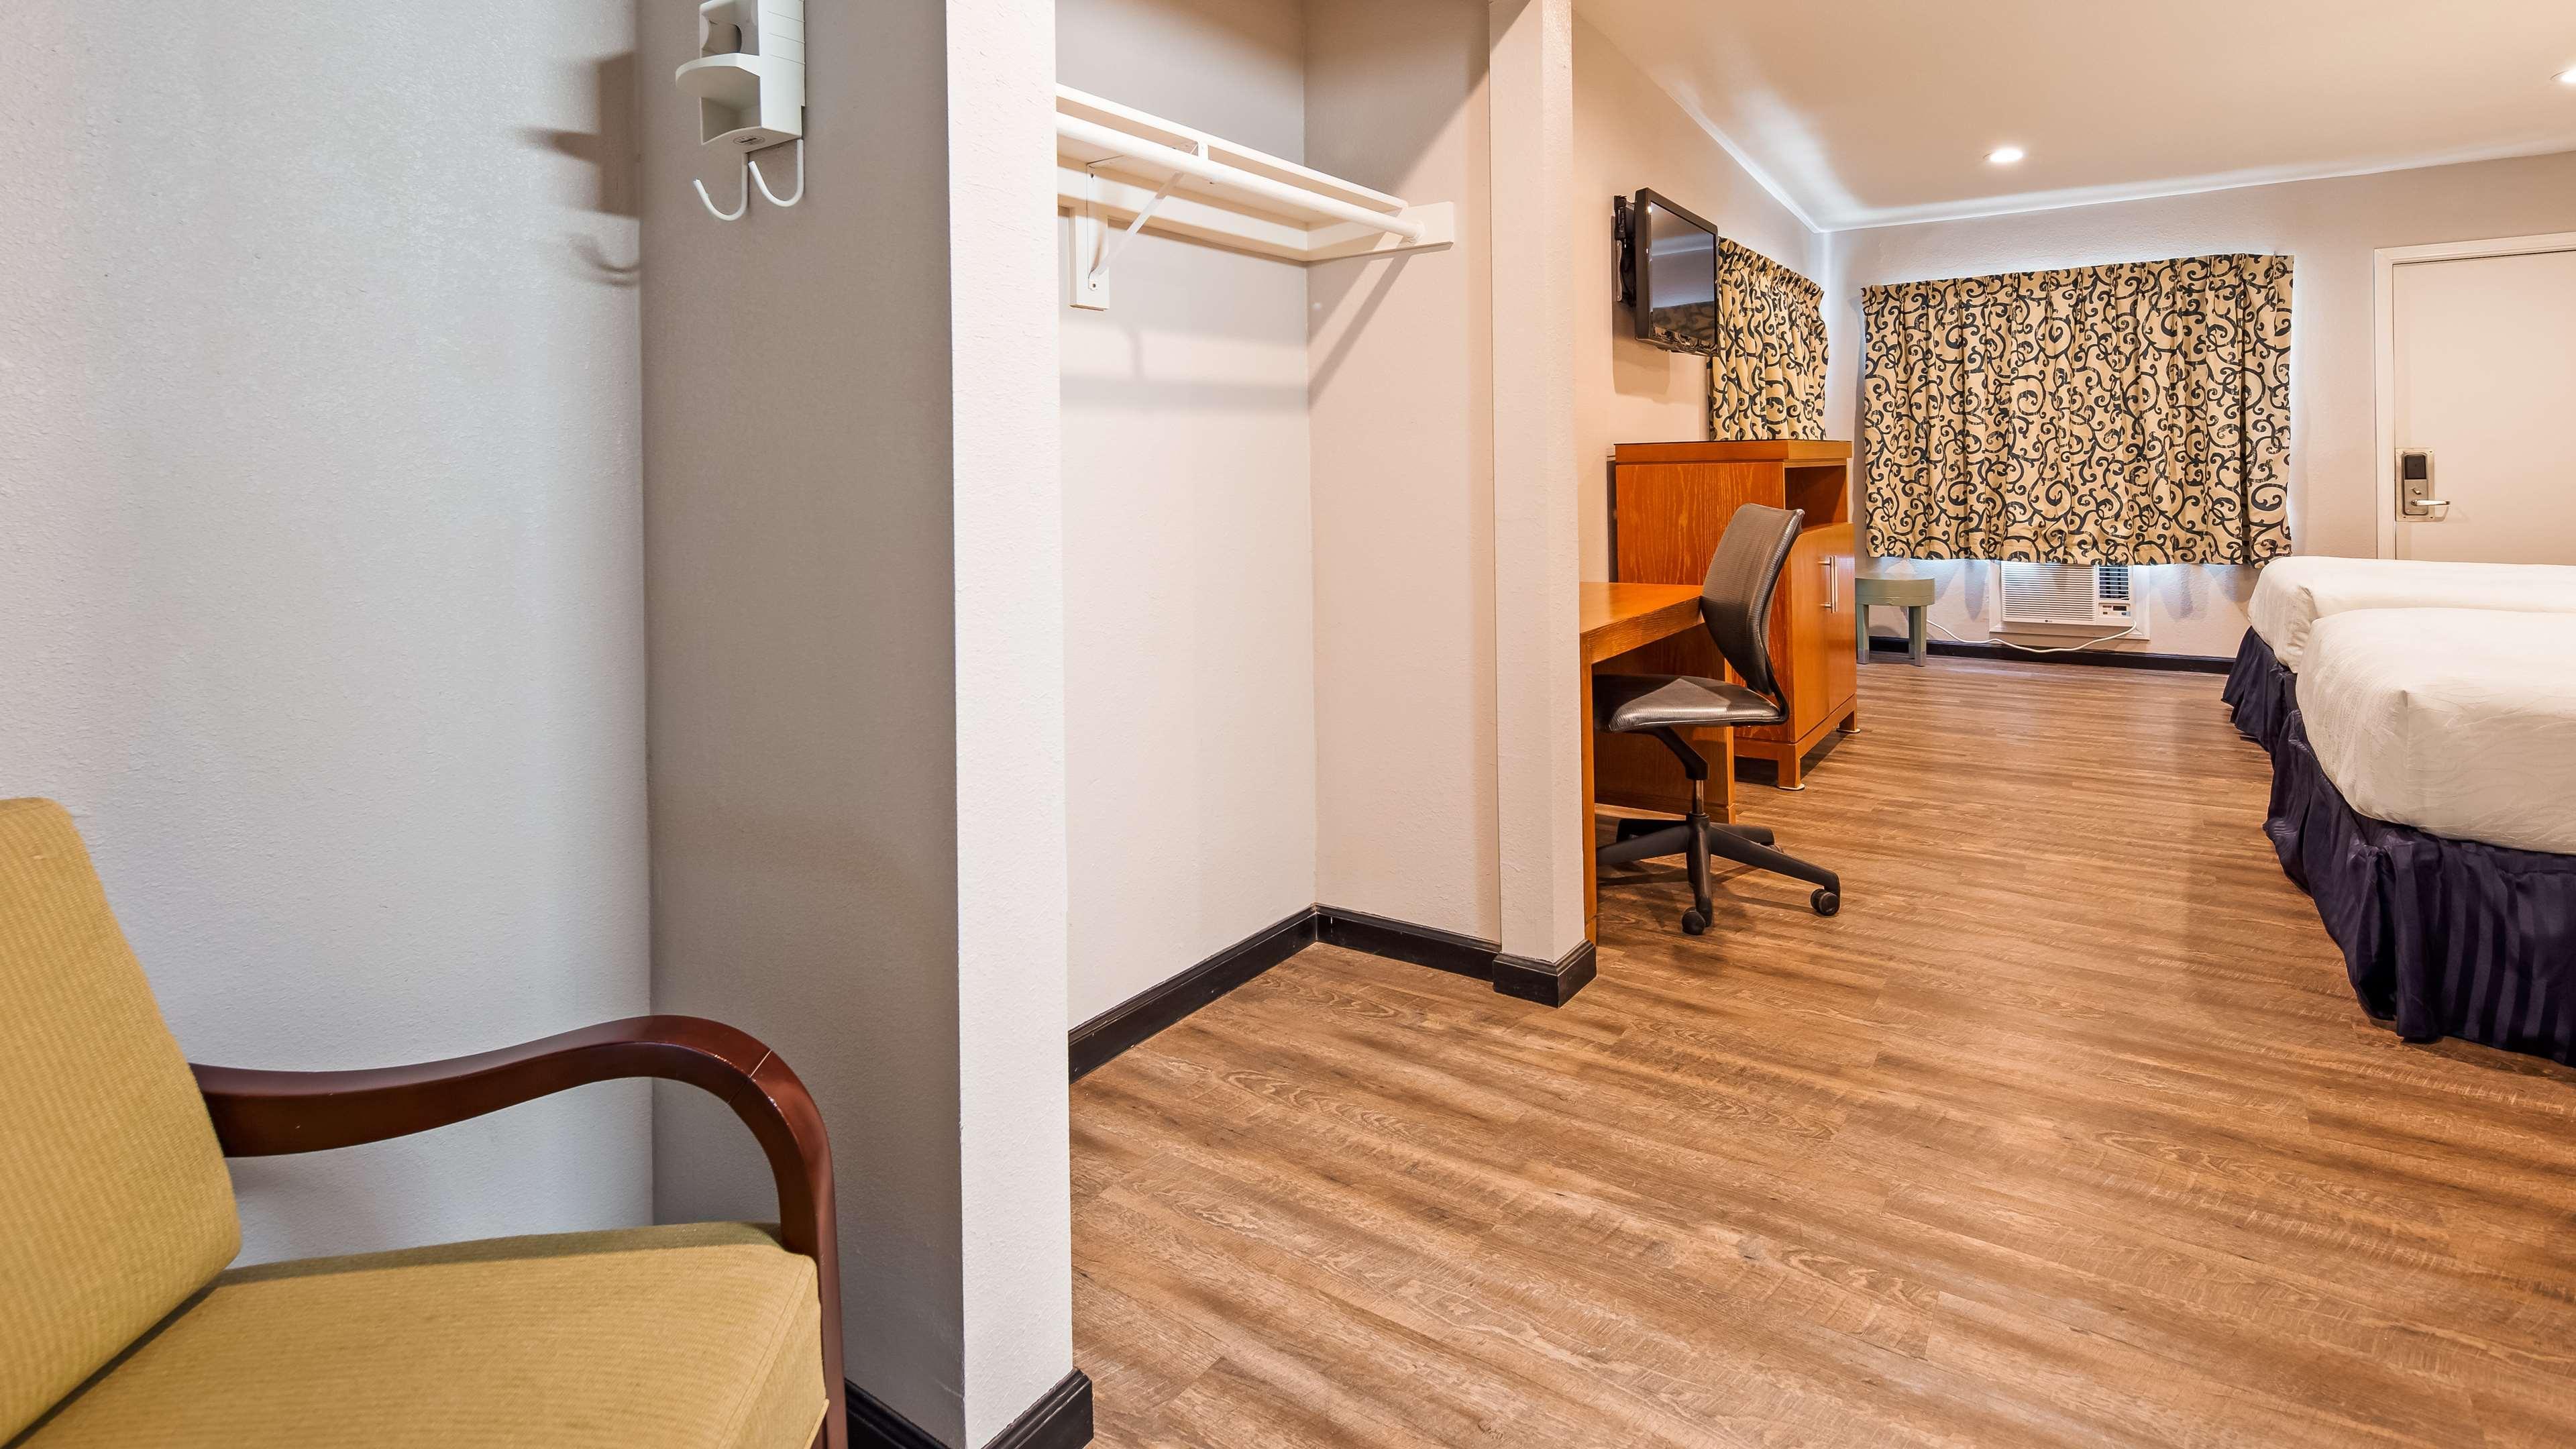 SureStay Hotel by Best Western Ridgecrest image 8